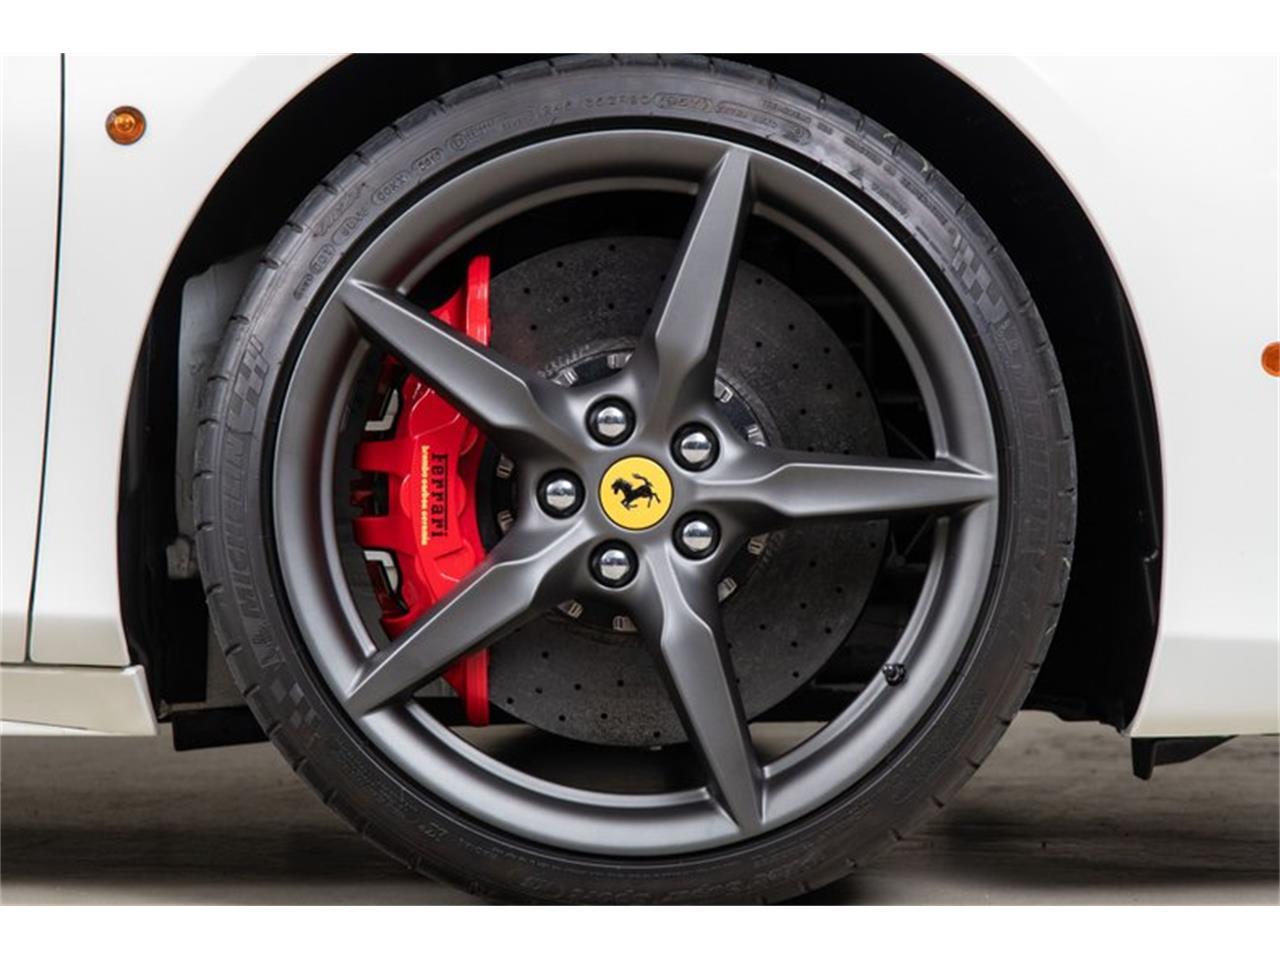 2017 Ferrari 488 (CC-1312507) for sale in Scotts Valley, California